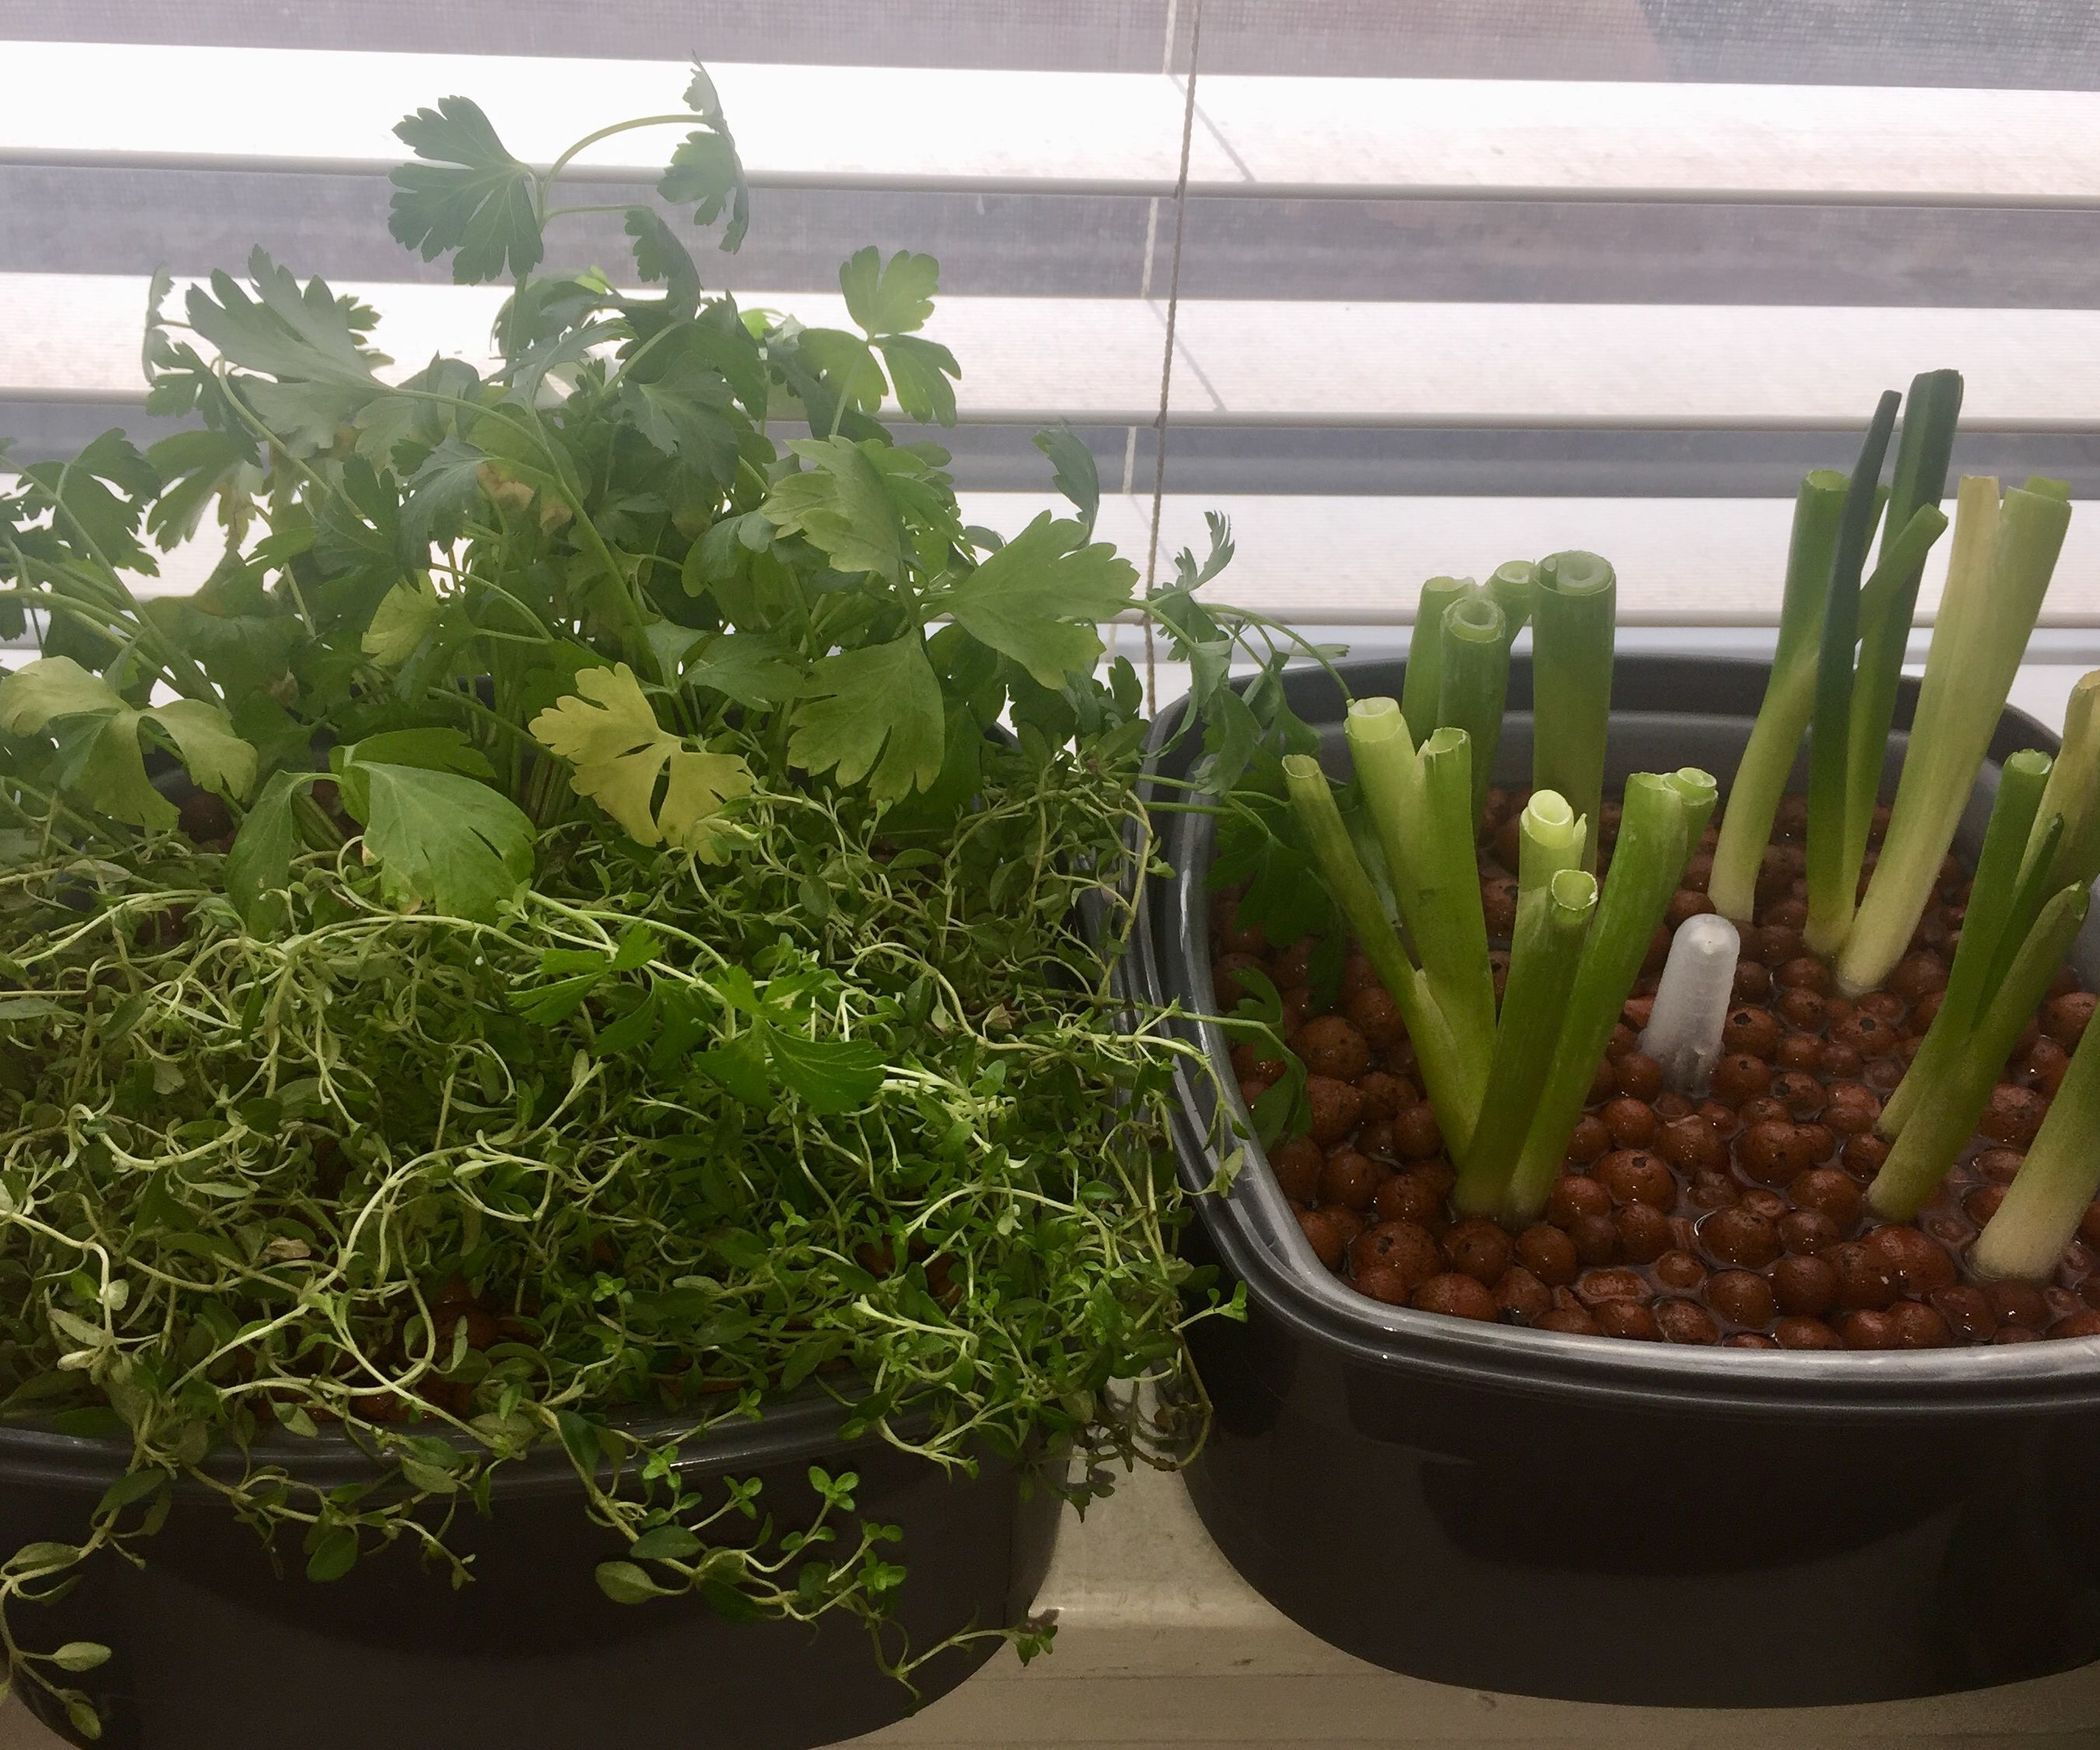 Easy no tools indoor hydroponic herb garden for under 20